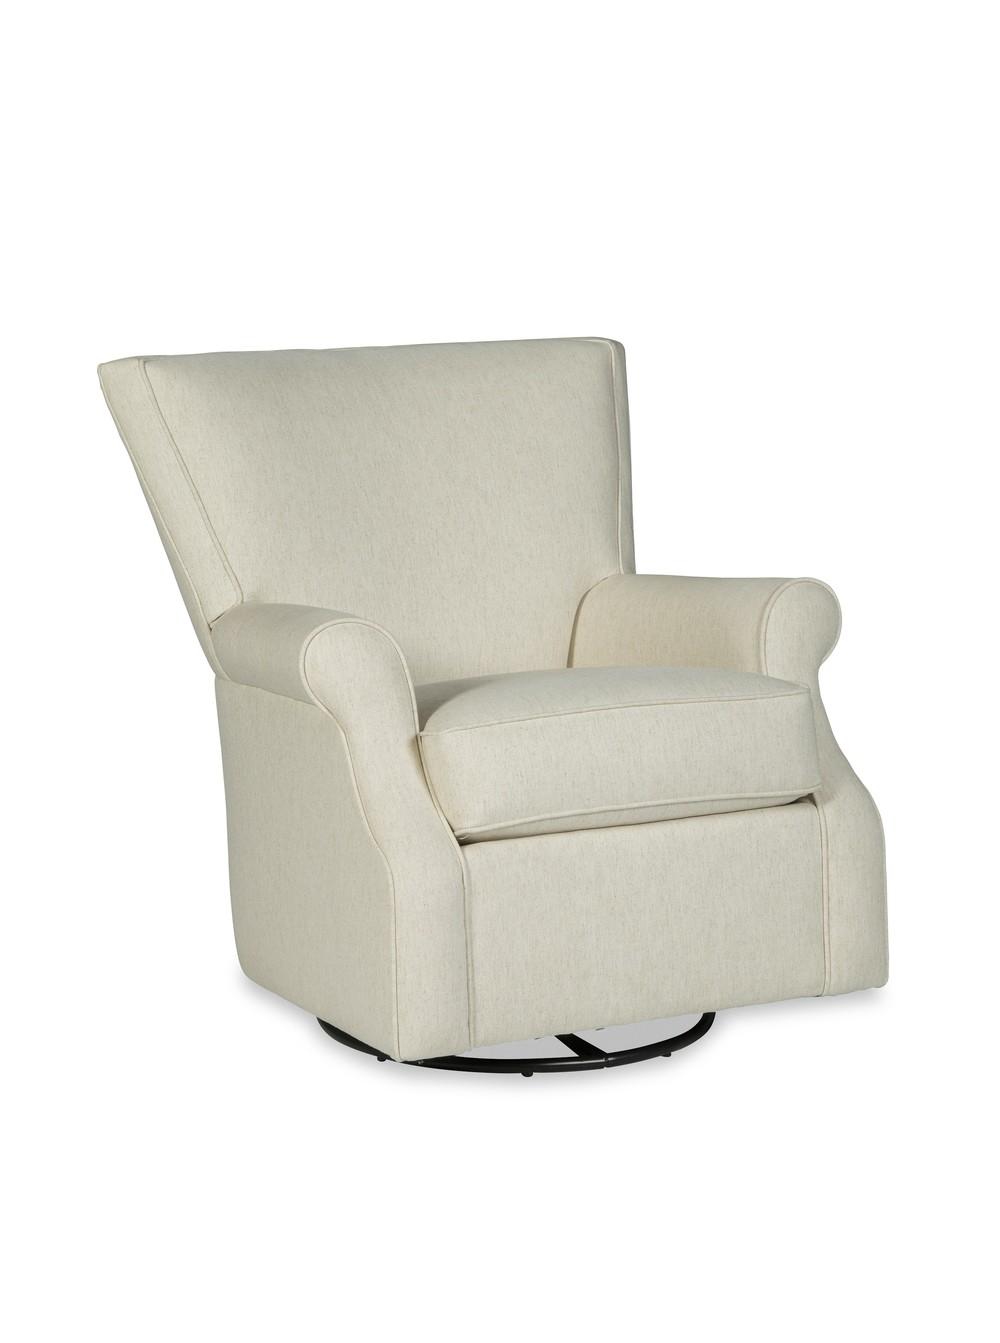 Craftmaster Furniture - Swivel Glider